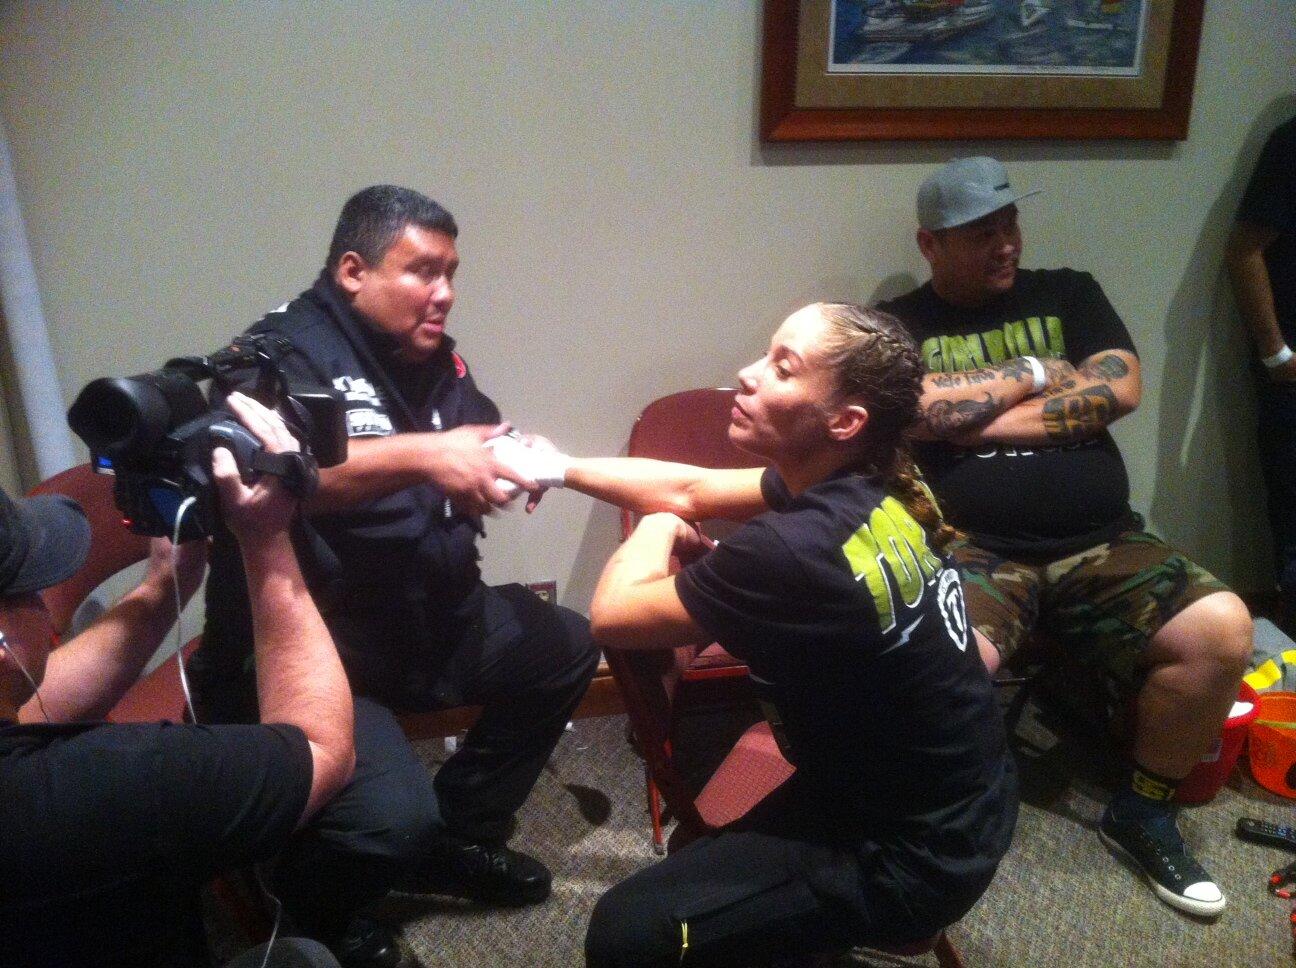 UFC's Twitter Photo